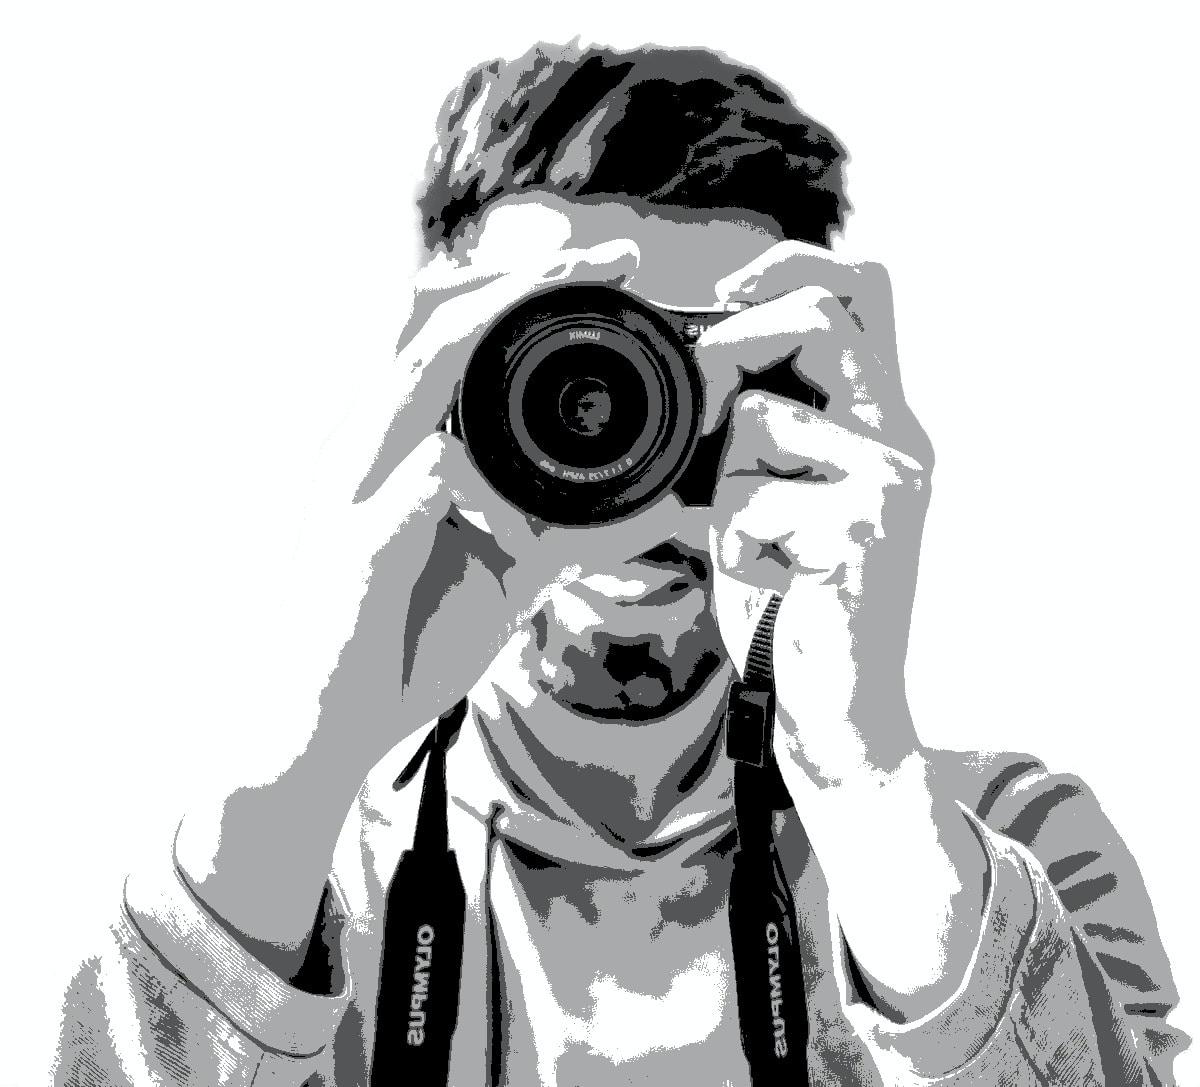 Go to Filip Trefil's profile